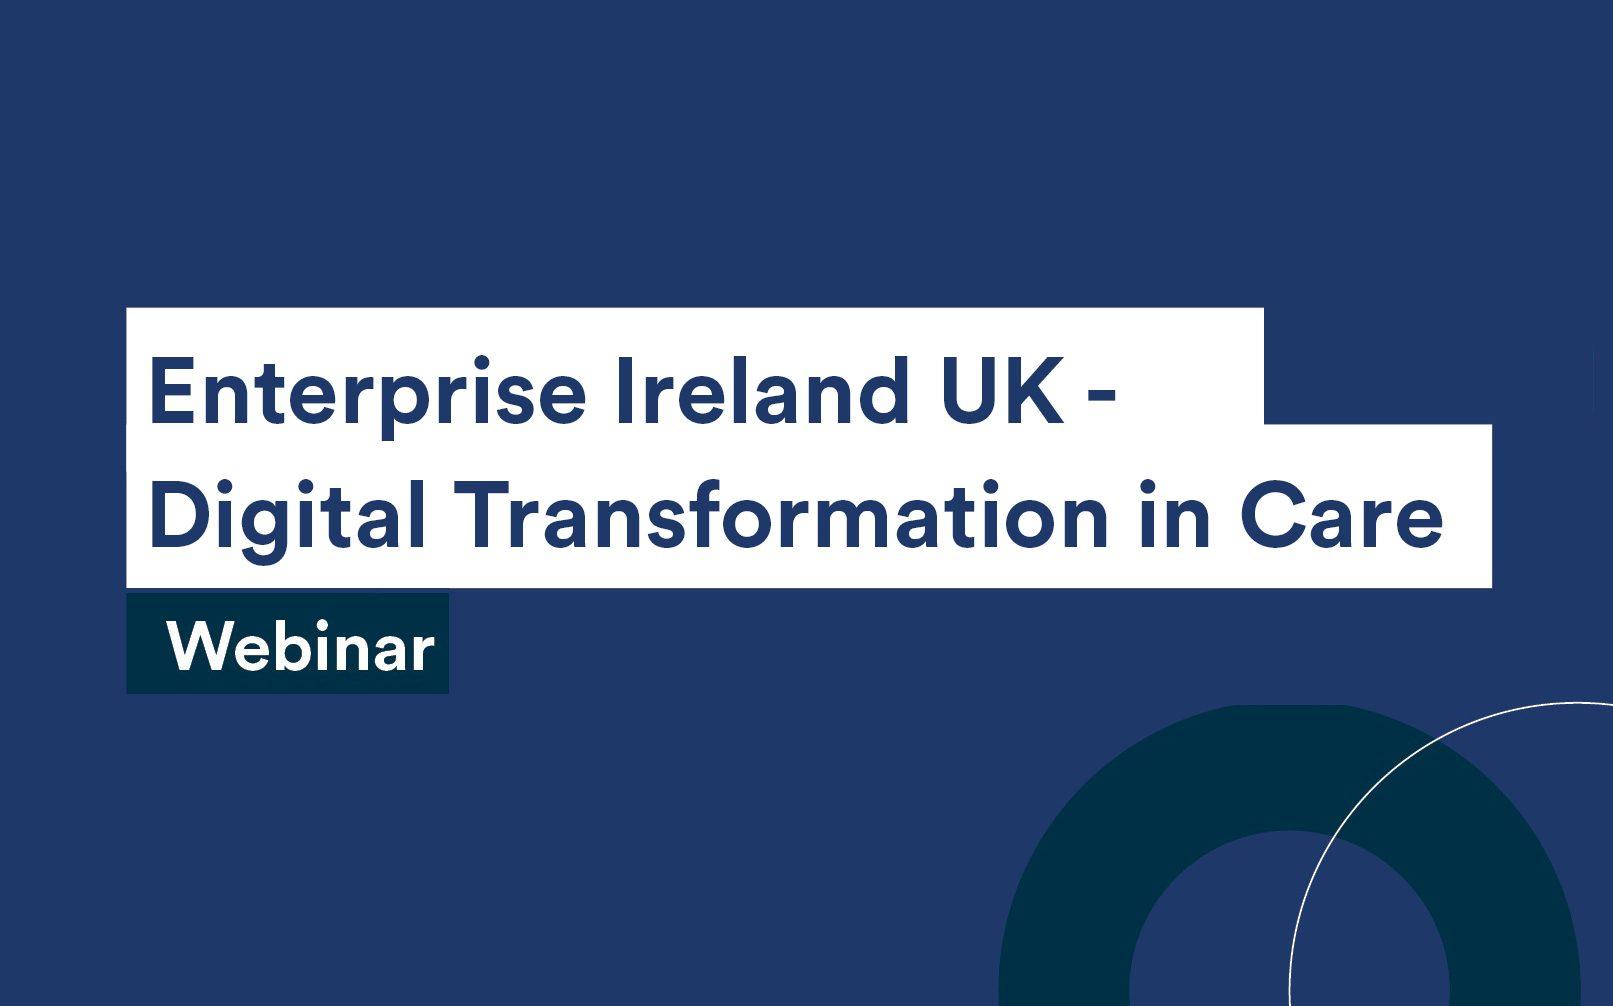 Digital Transformation in Care - Webinar